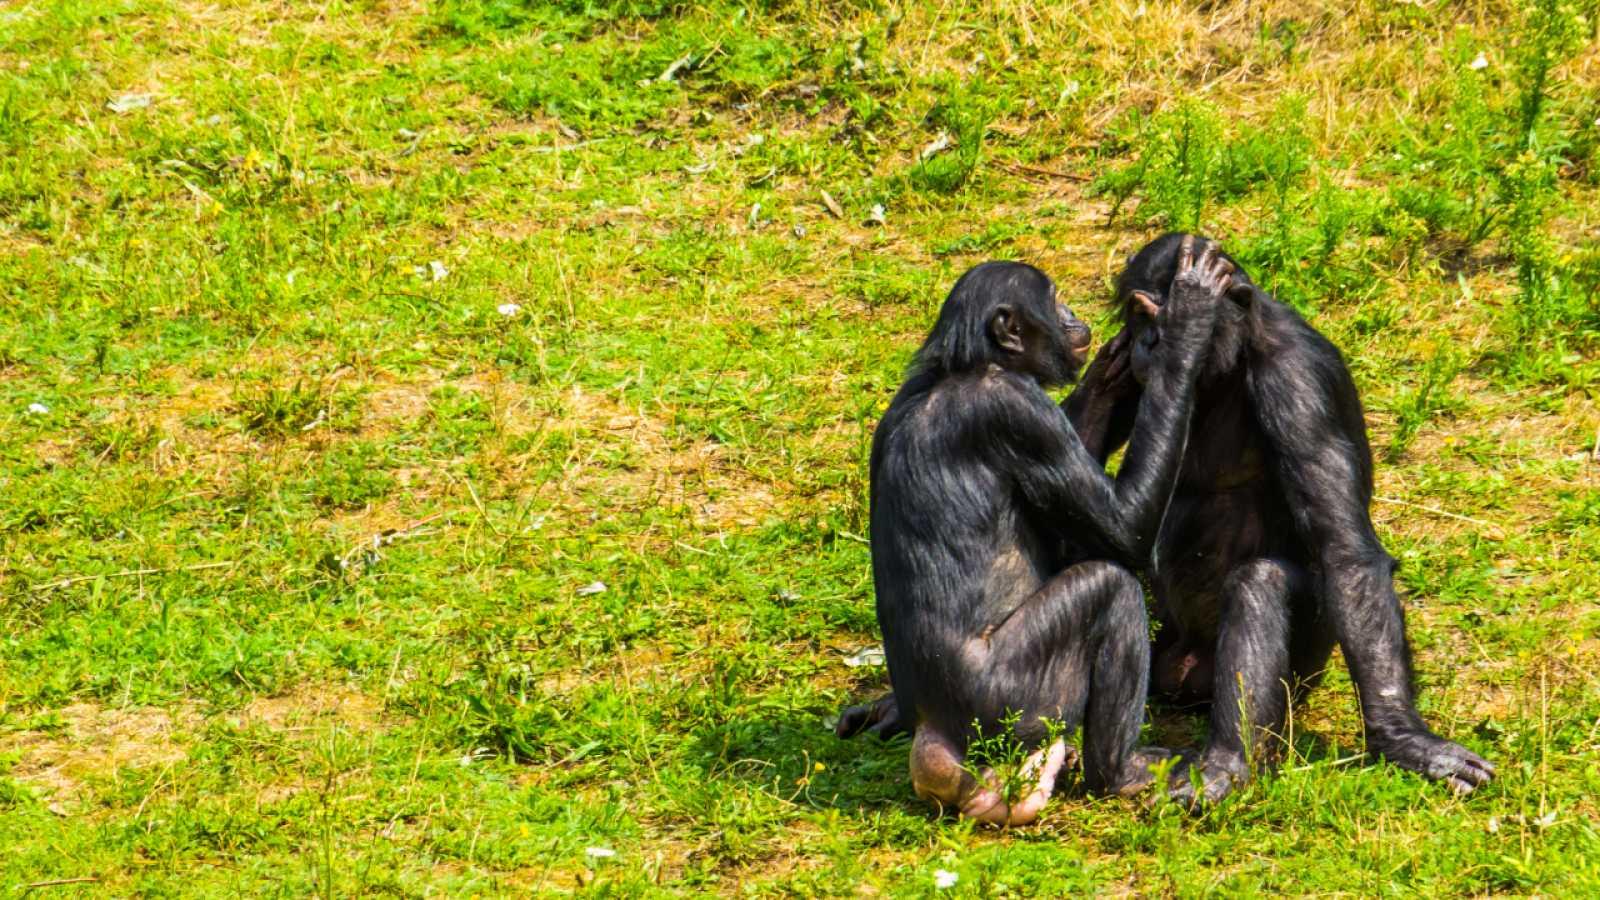 Aquí la Tierra - Pareja de bonobos en la selva